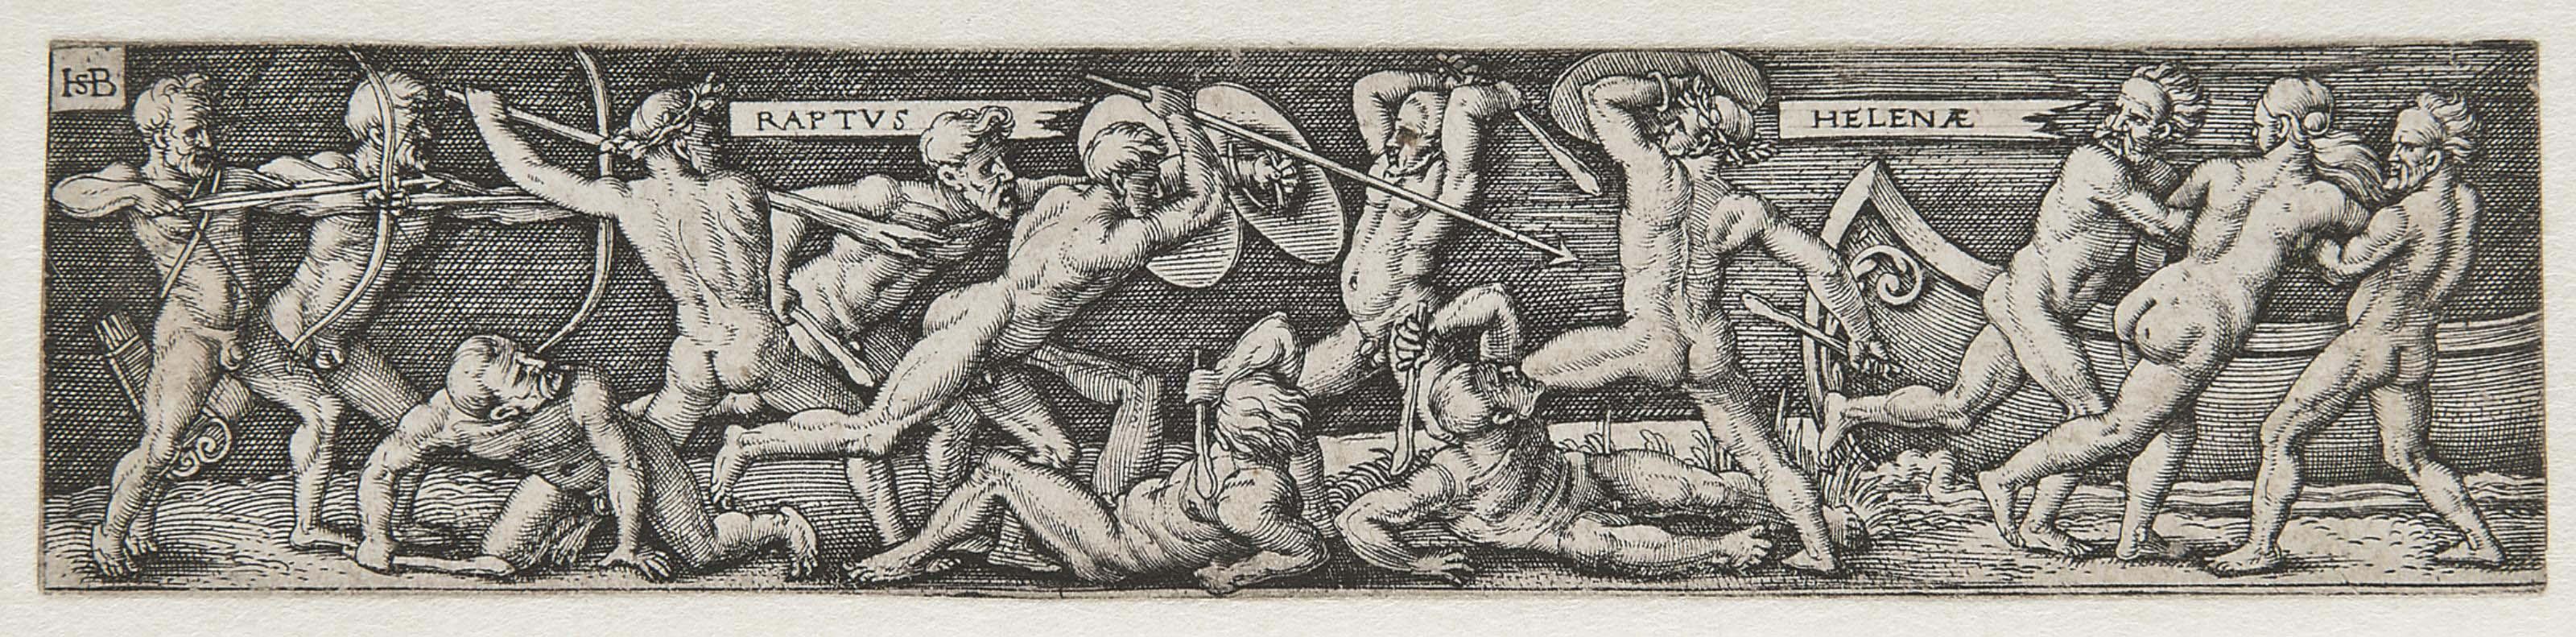 The Rape of Helena (Bartsch 70; Pauli 73)